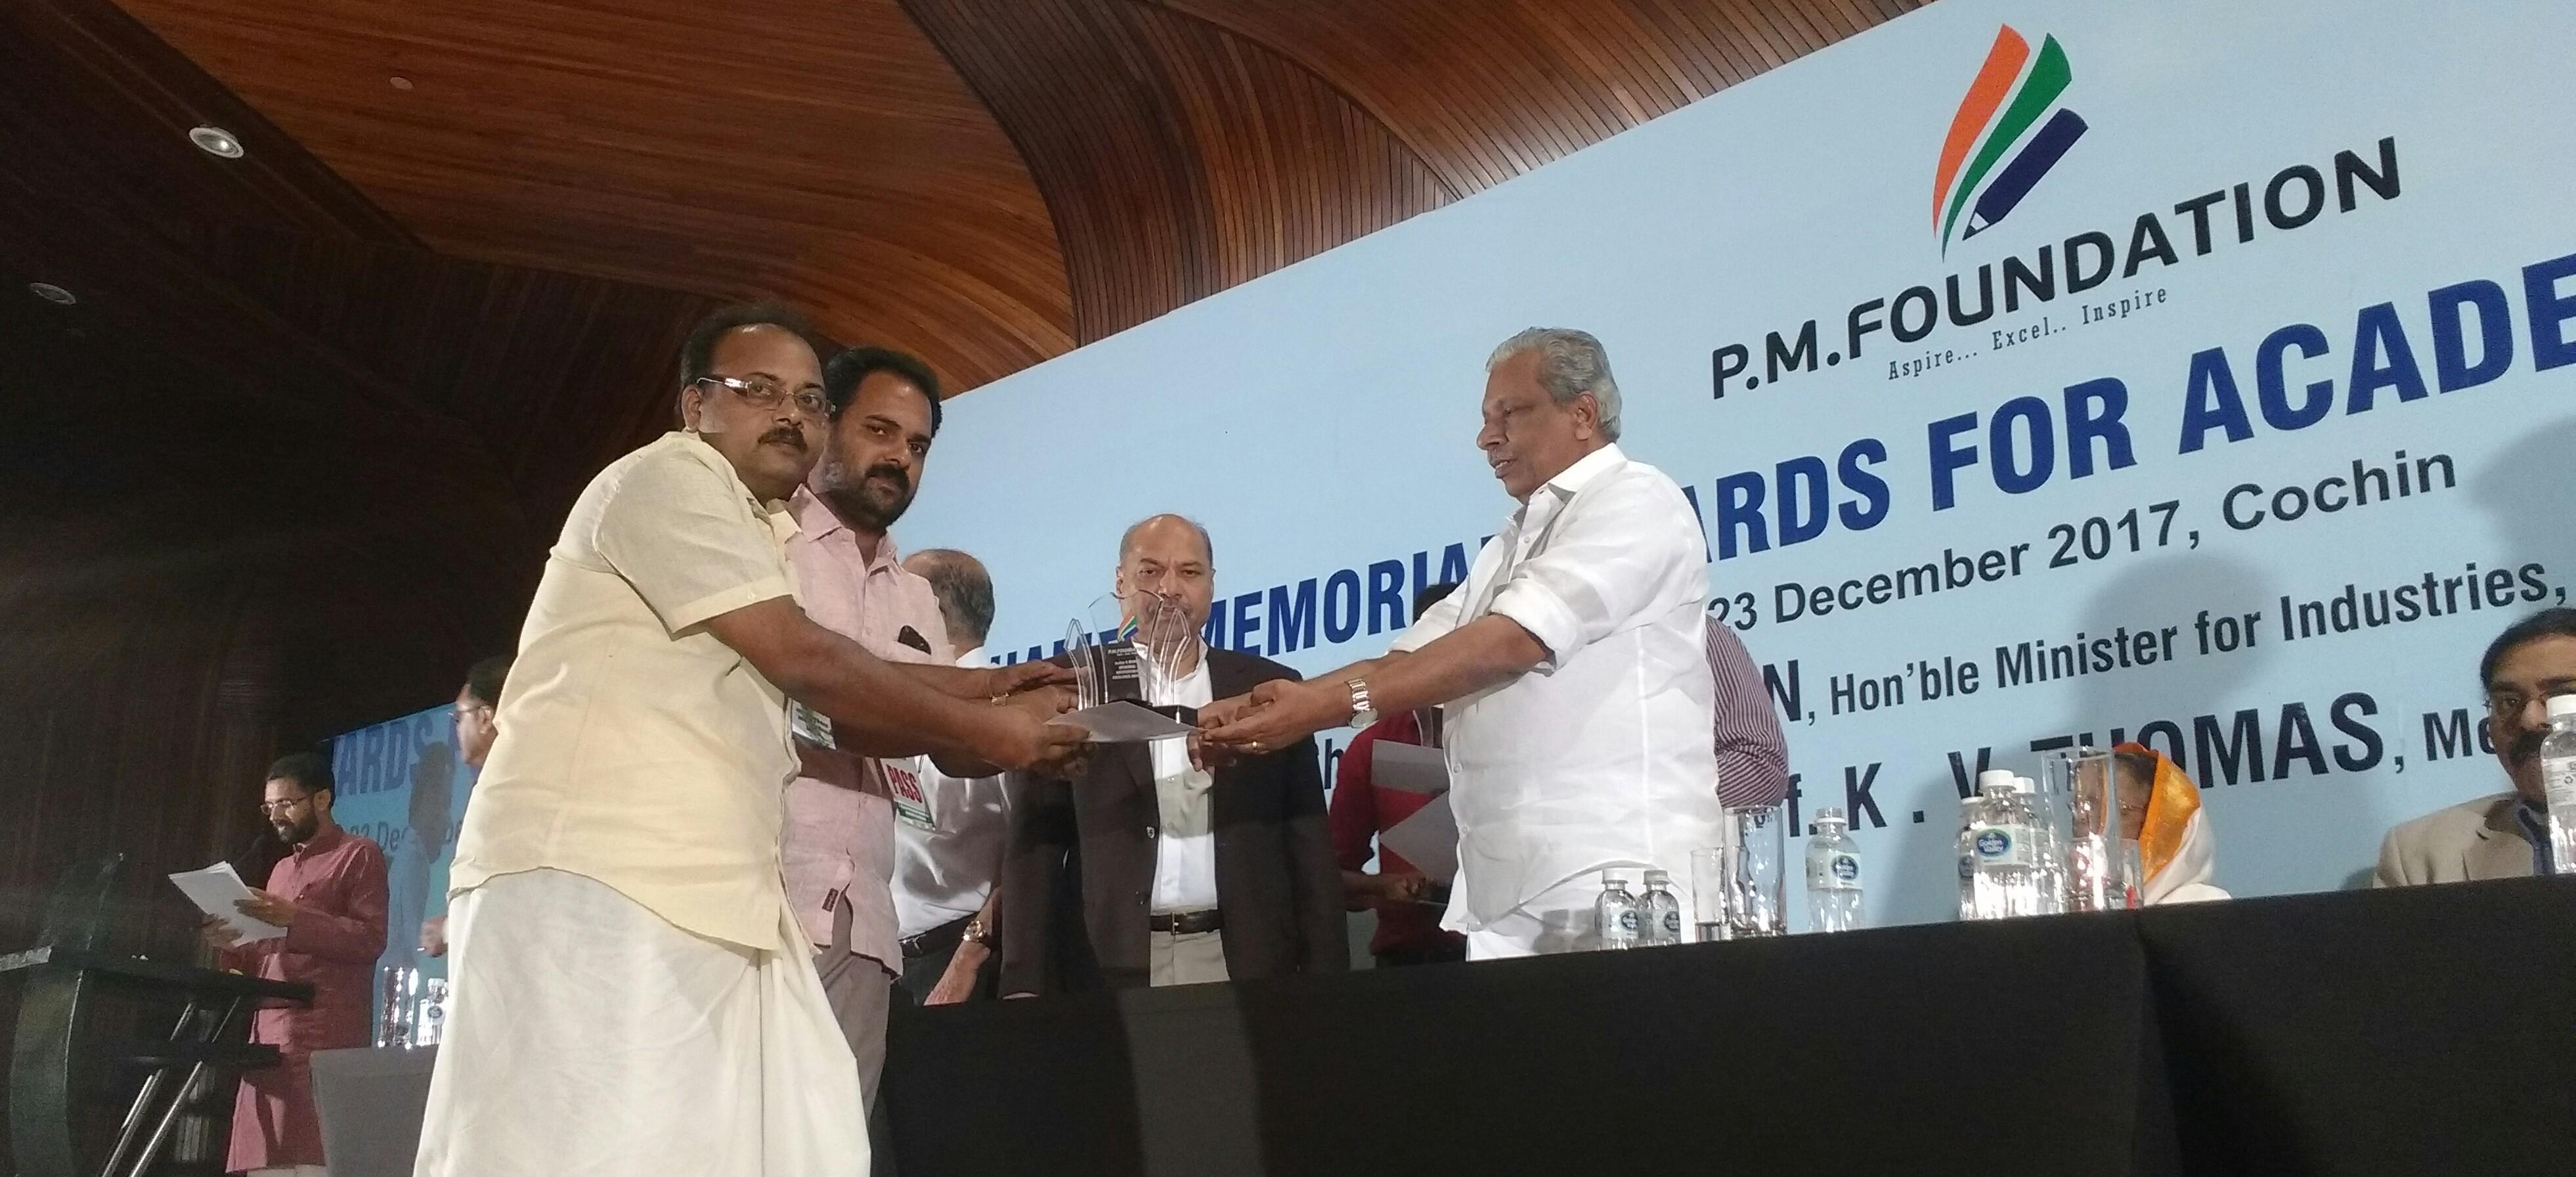 PM Foundation Award 2017